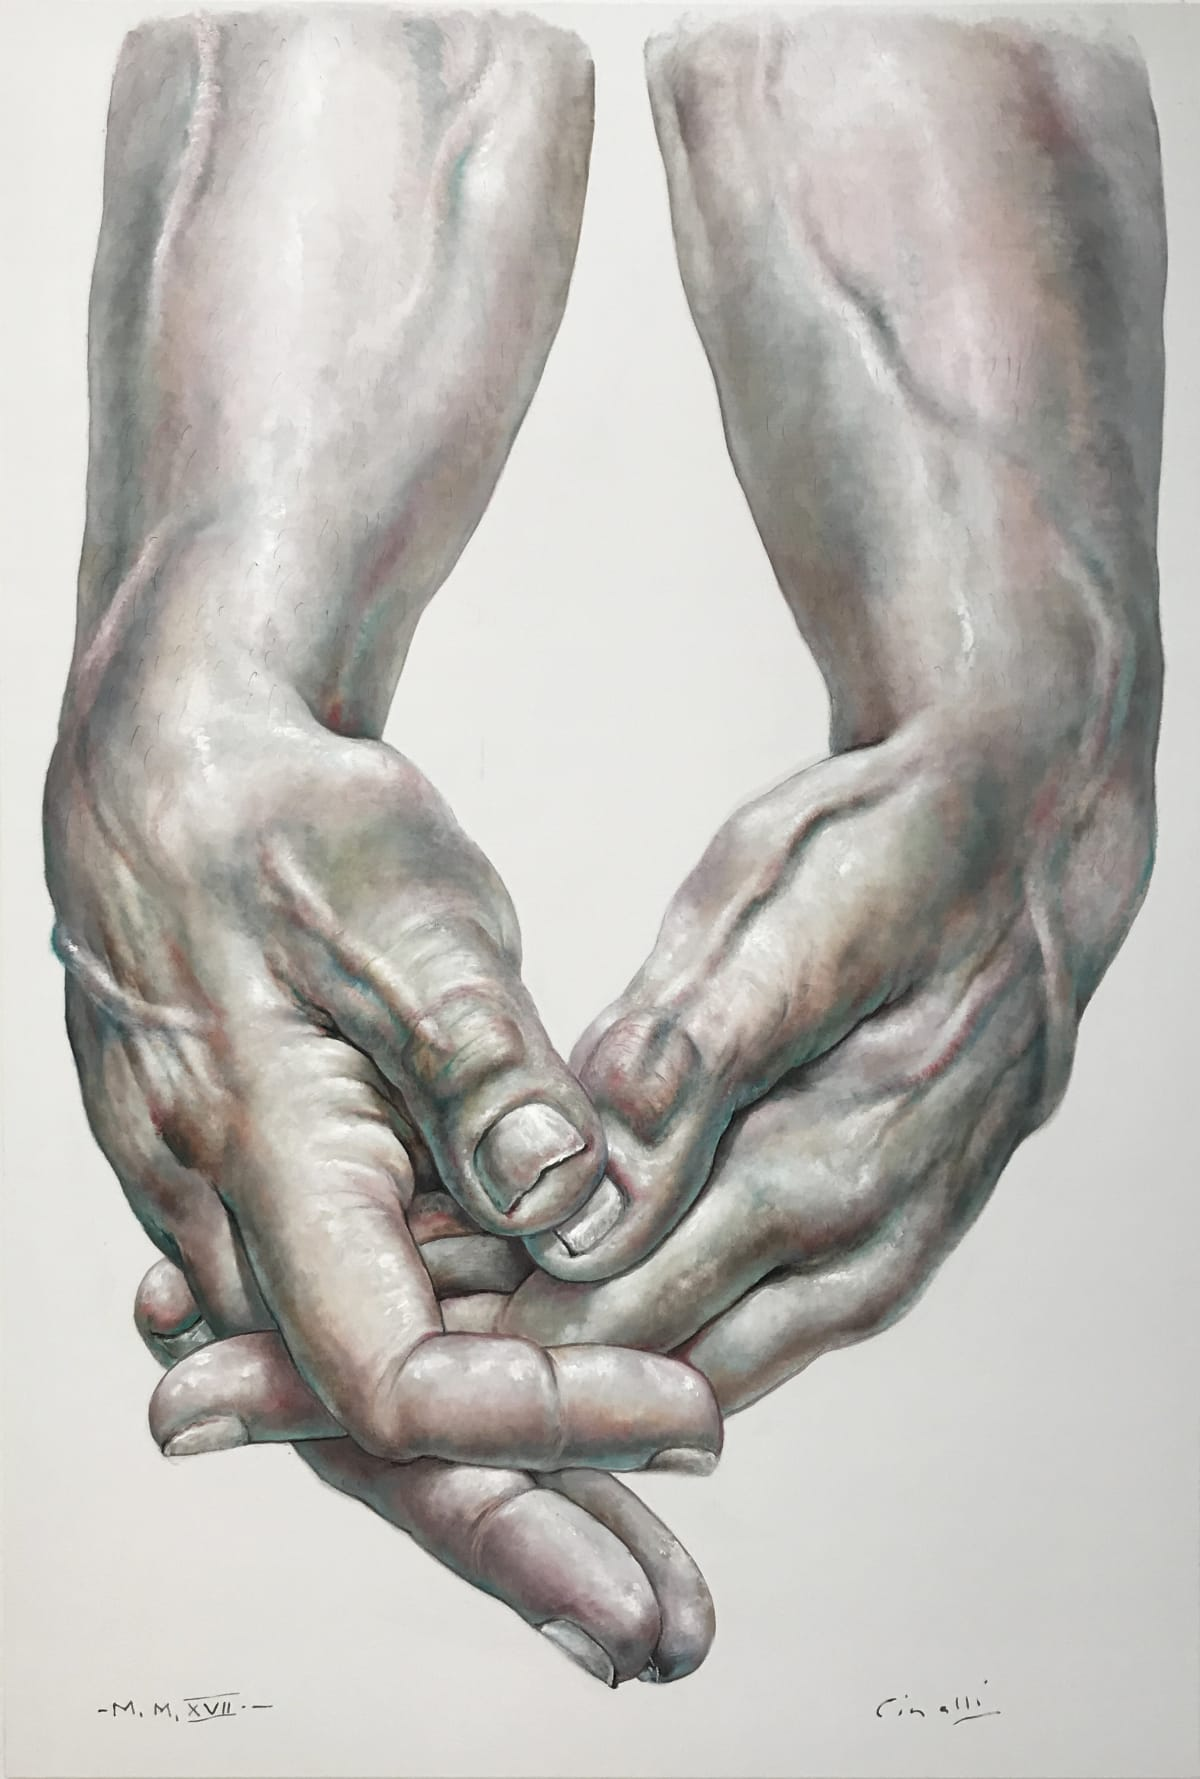 Ricardo Cinalli Contemplation Oil on canvas 206 x 140 cm